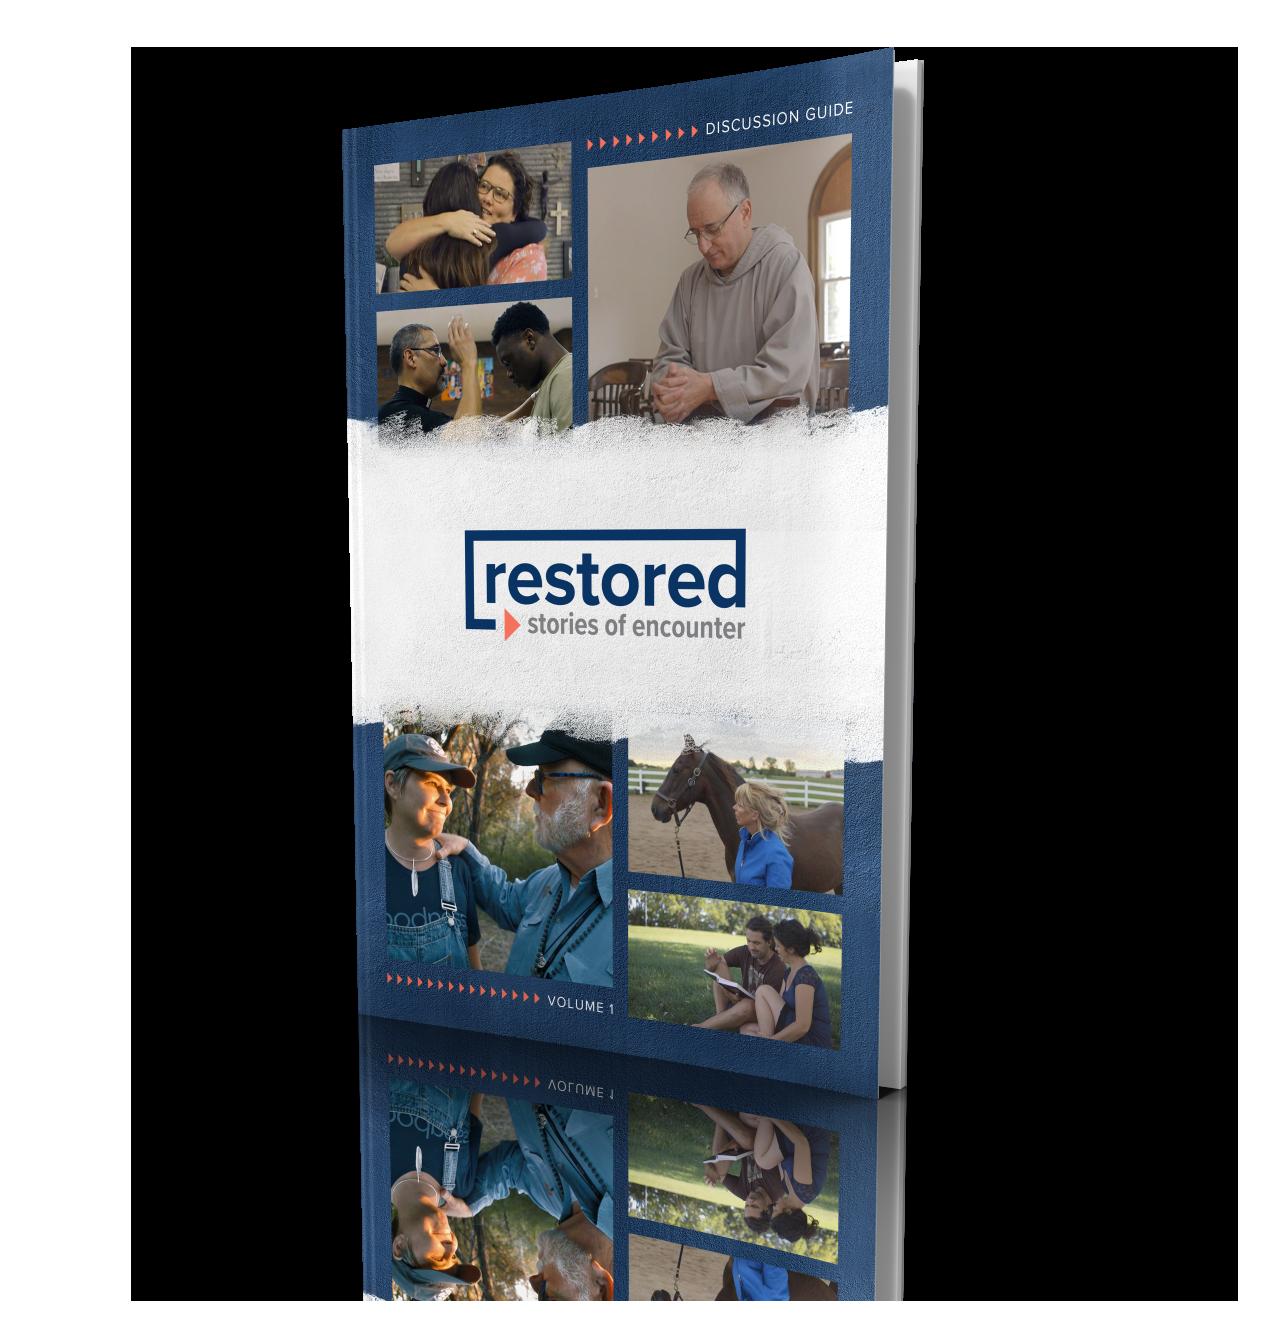 restoredDiscussionGuide.png